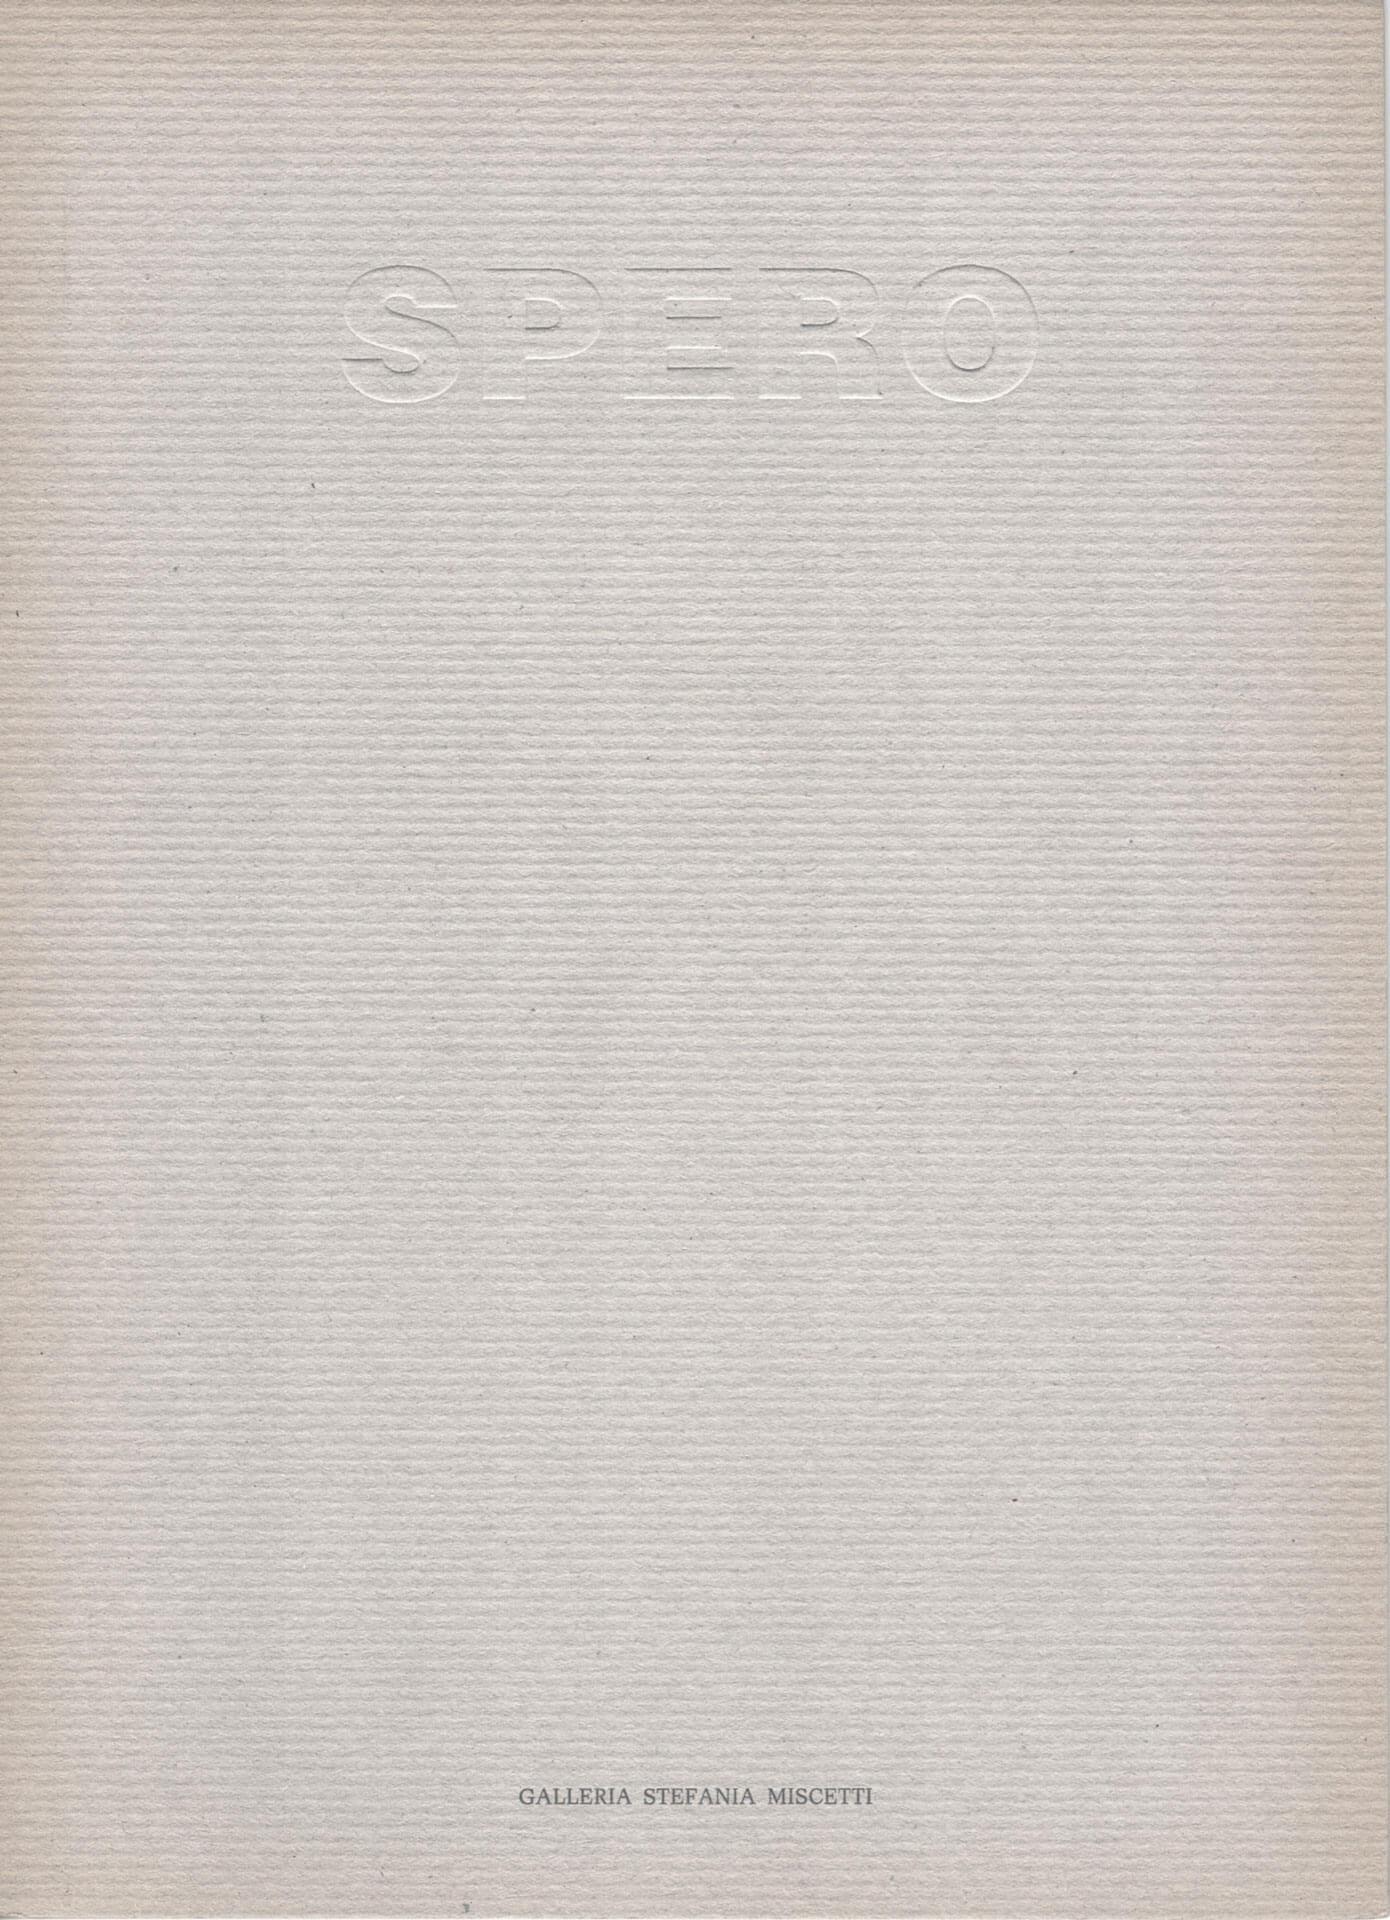 Studio Stefania Miscetti | Catalogues | Nancy Spero | Sky Goddess, Egyptian Acrobat